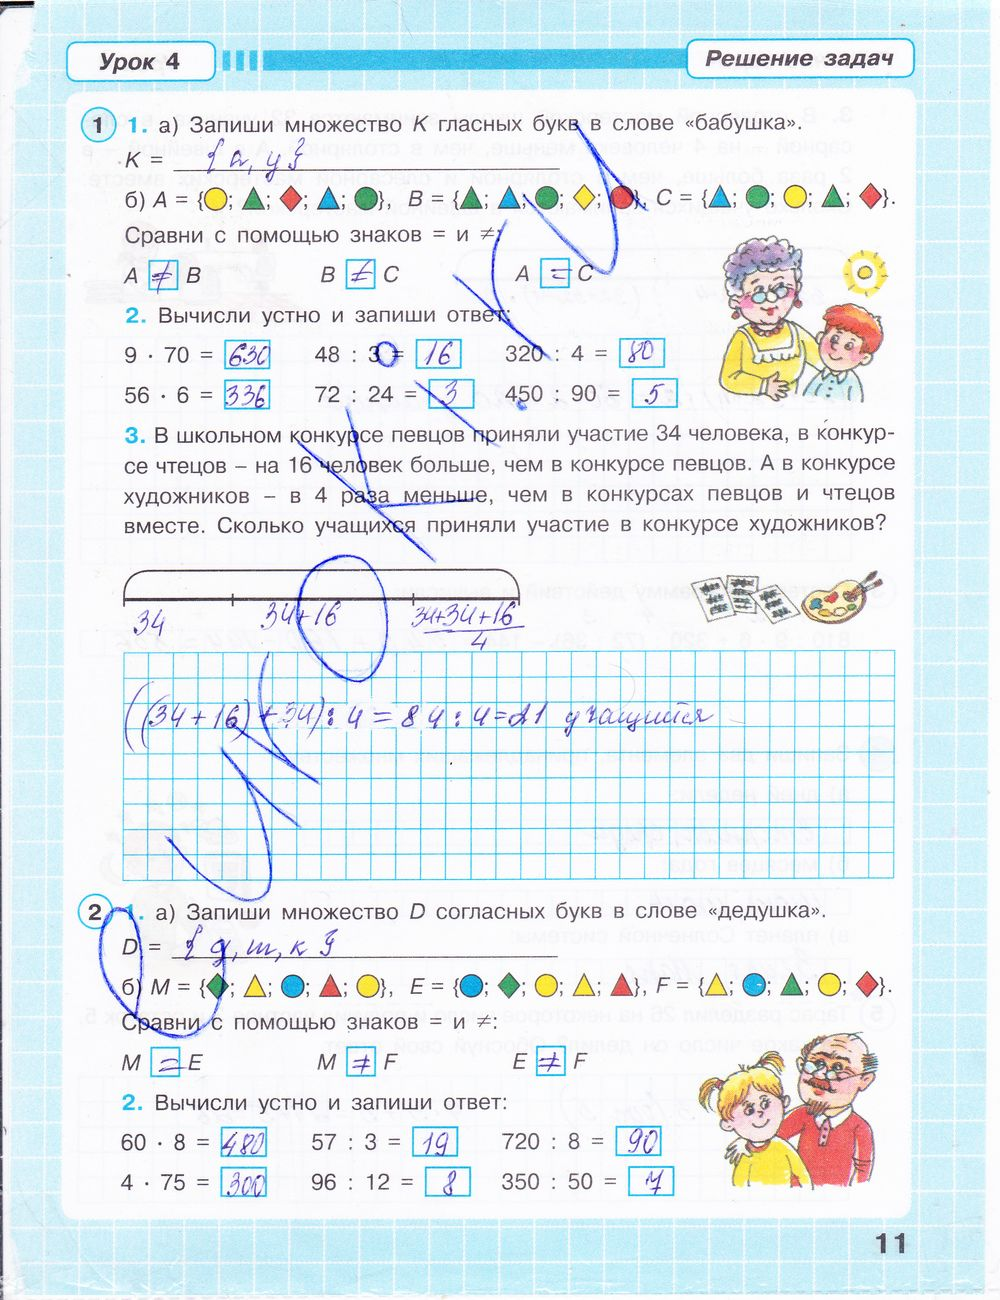 Диктант первоцветы 4 класс перспективная начальная школа